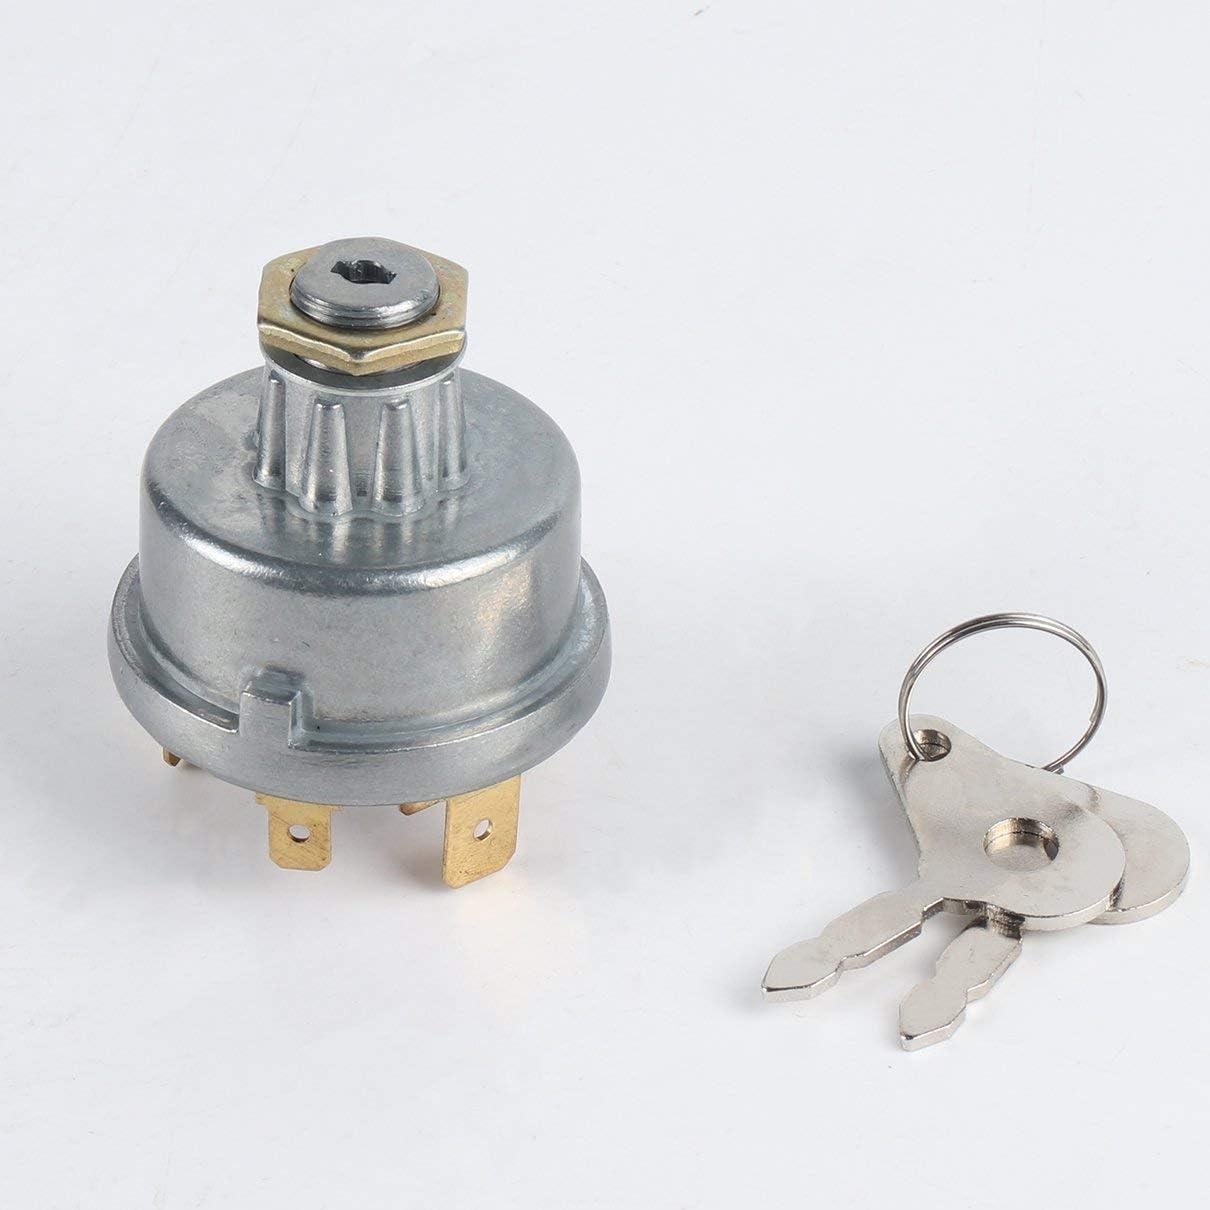 Tractor Ignition Switch Ignition Lock Starter 12239 for Massey Ferguson for David Brown for Case for John Deere